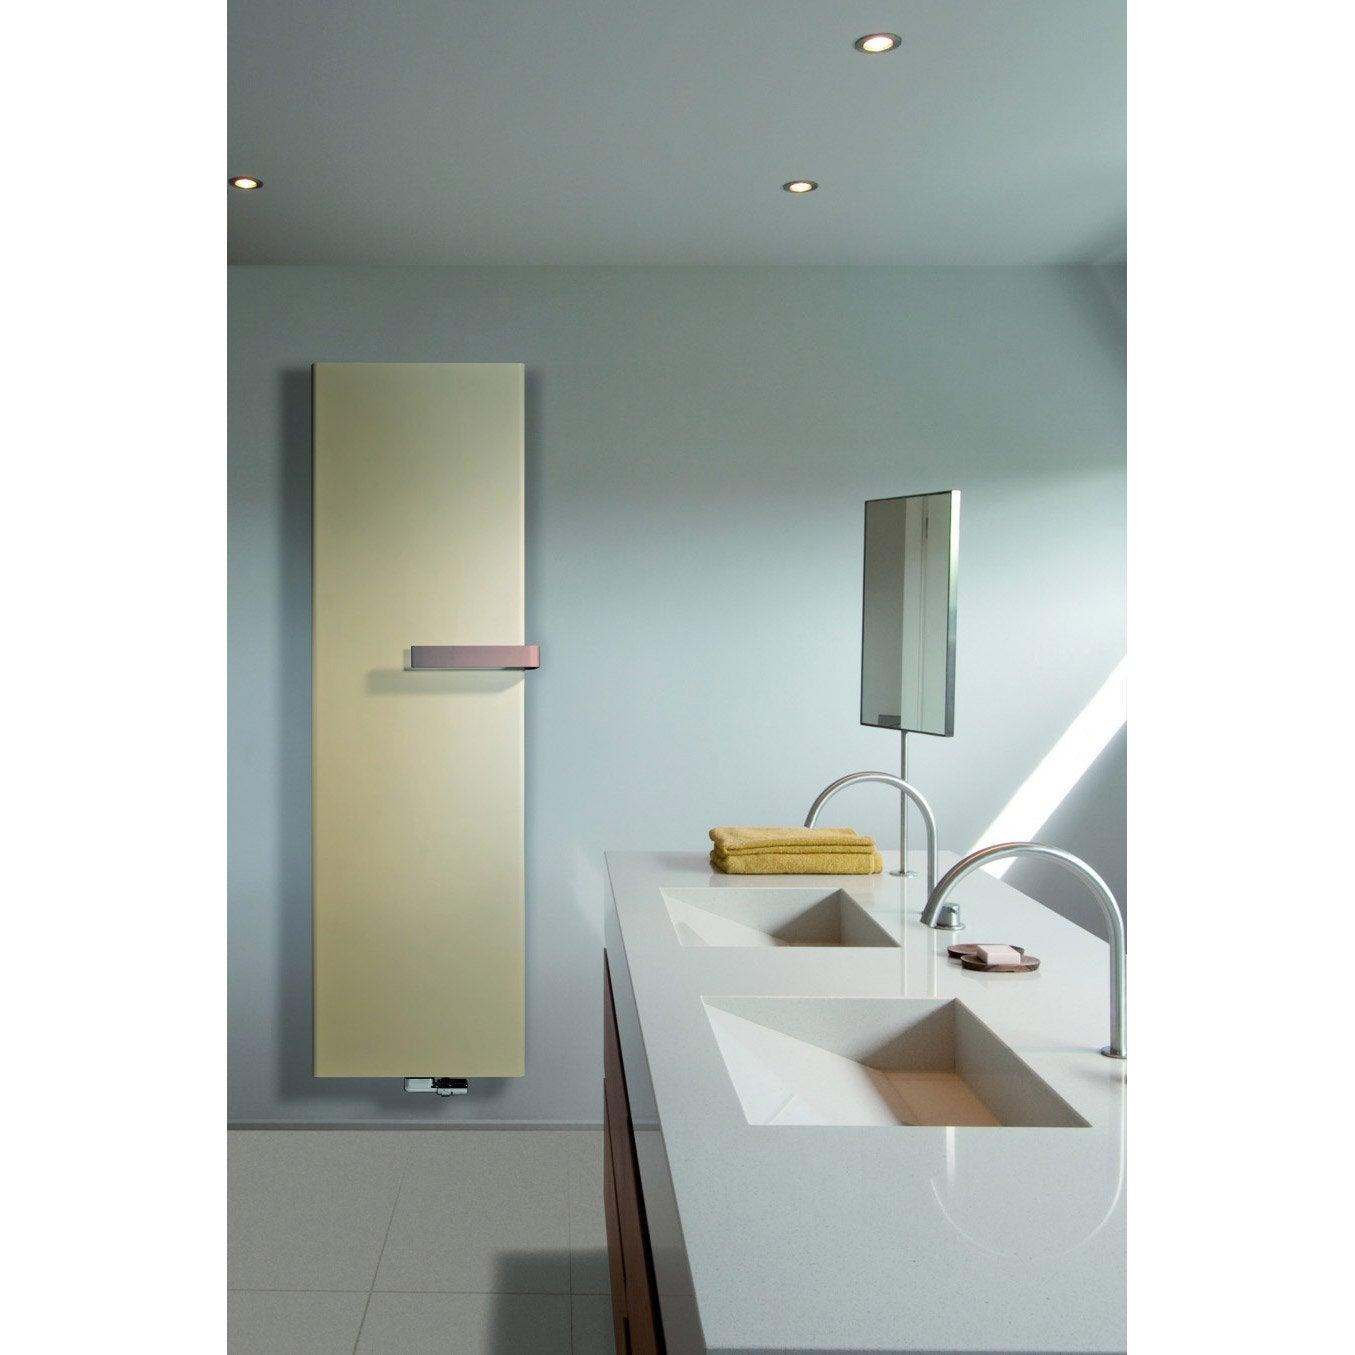 radiateur chauffage central nivasoft gris anthracite sabl cm 645 w leroy merlin. Black Bedroom Furniture Sets. Home Design Ideas